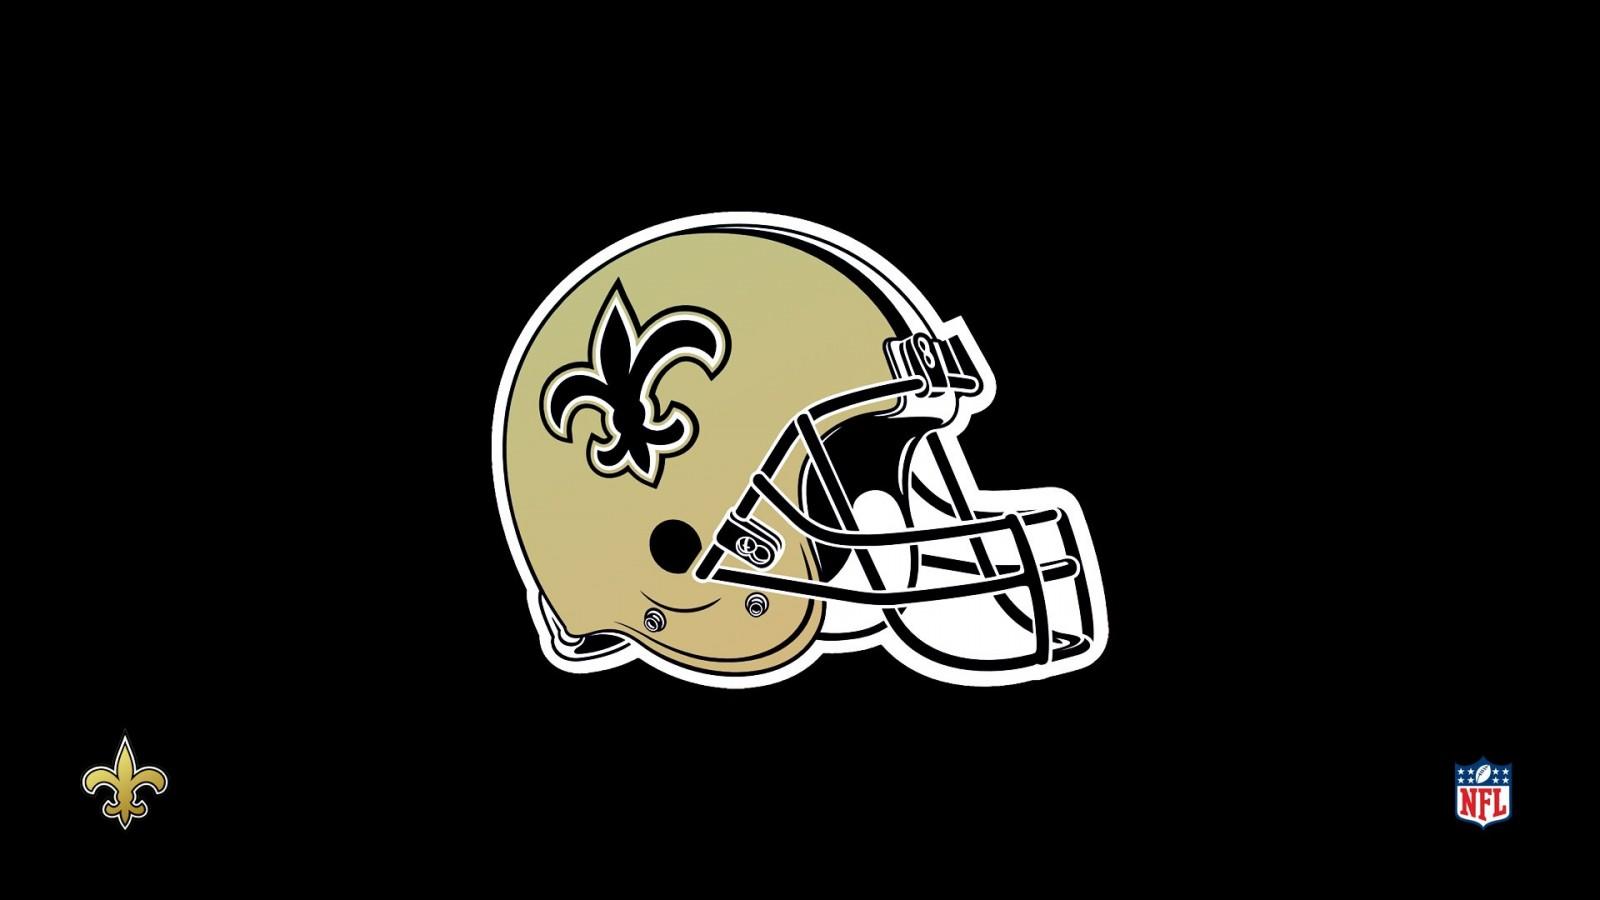 NFL New Orleans Saints negro HD Wallpaper